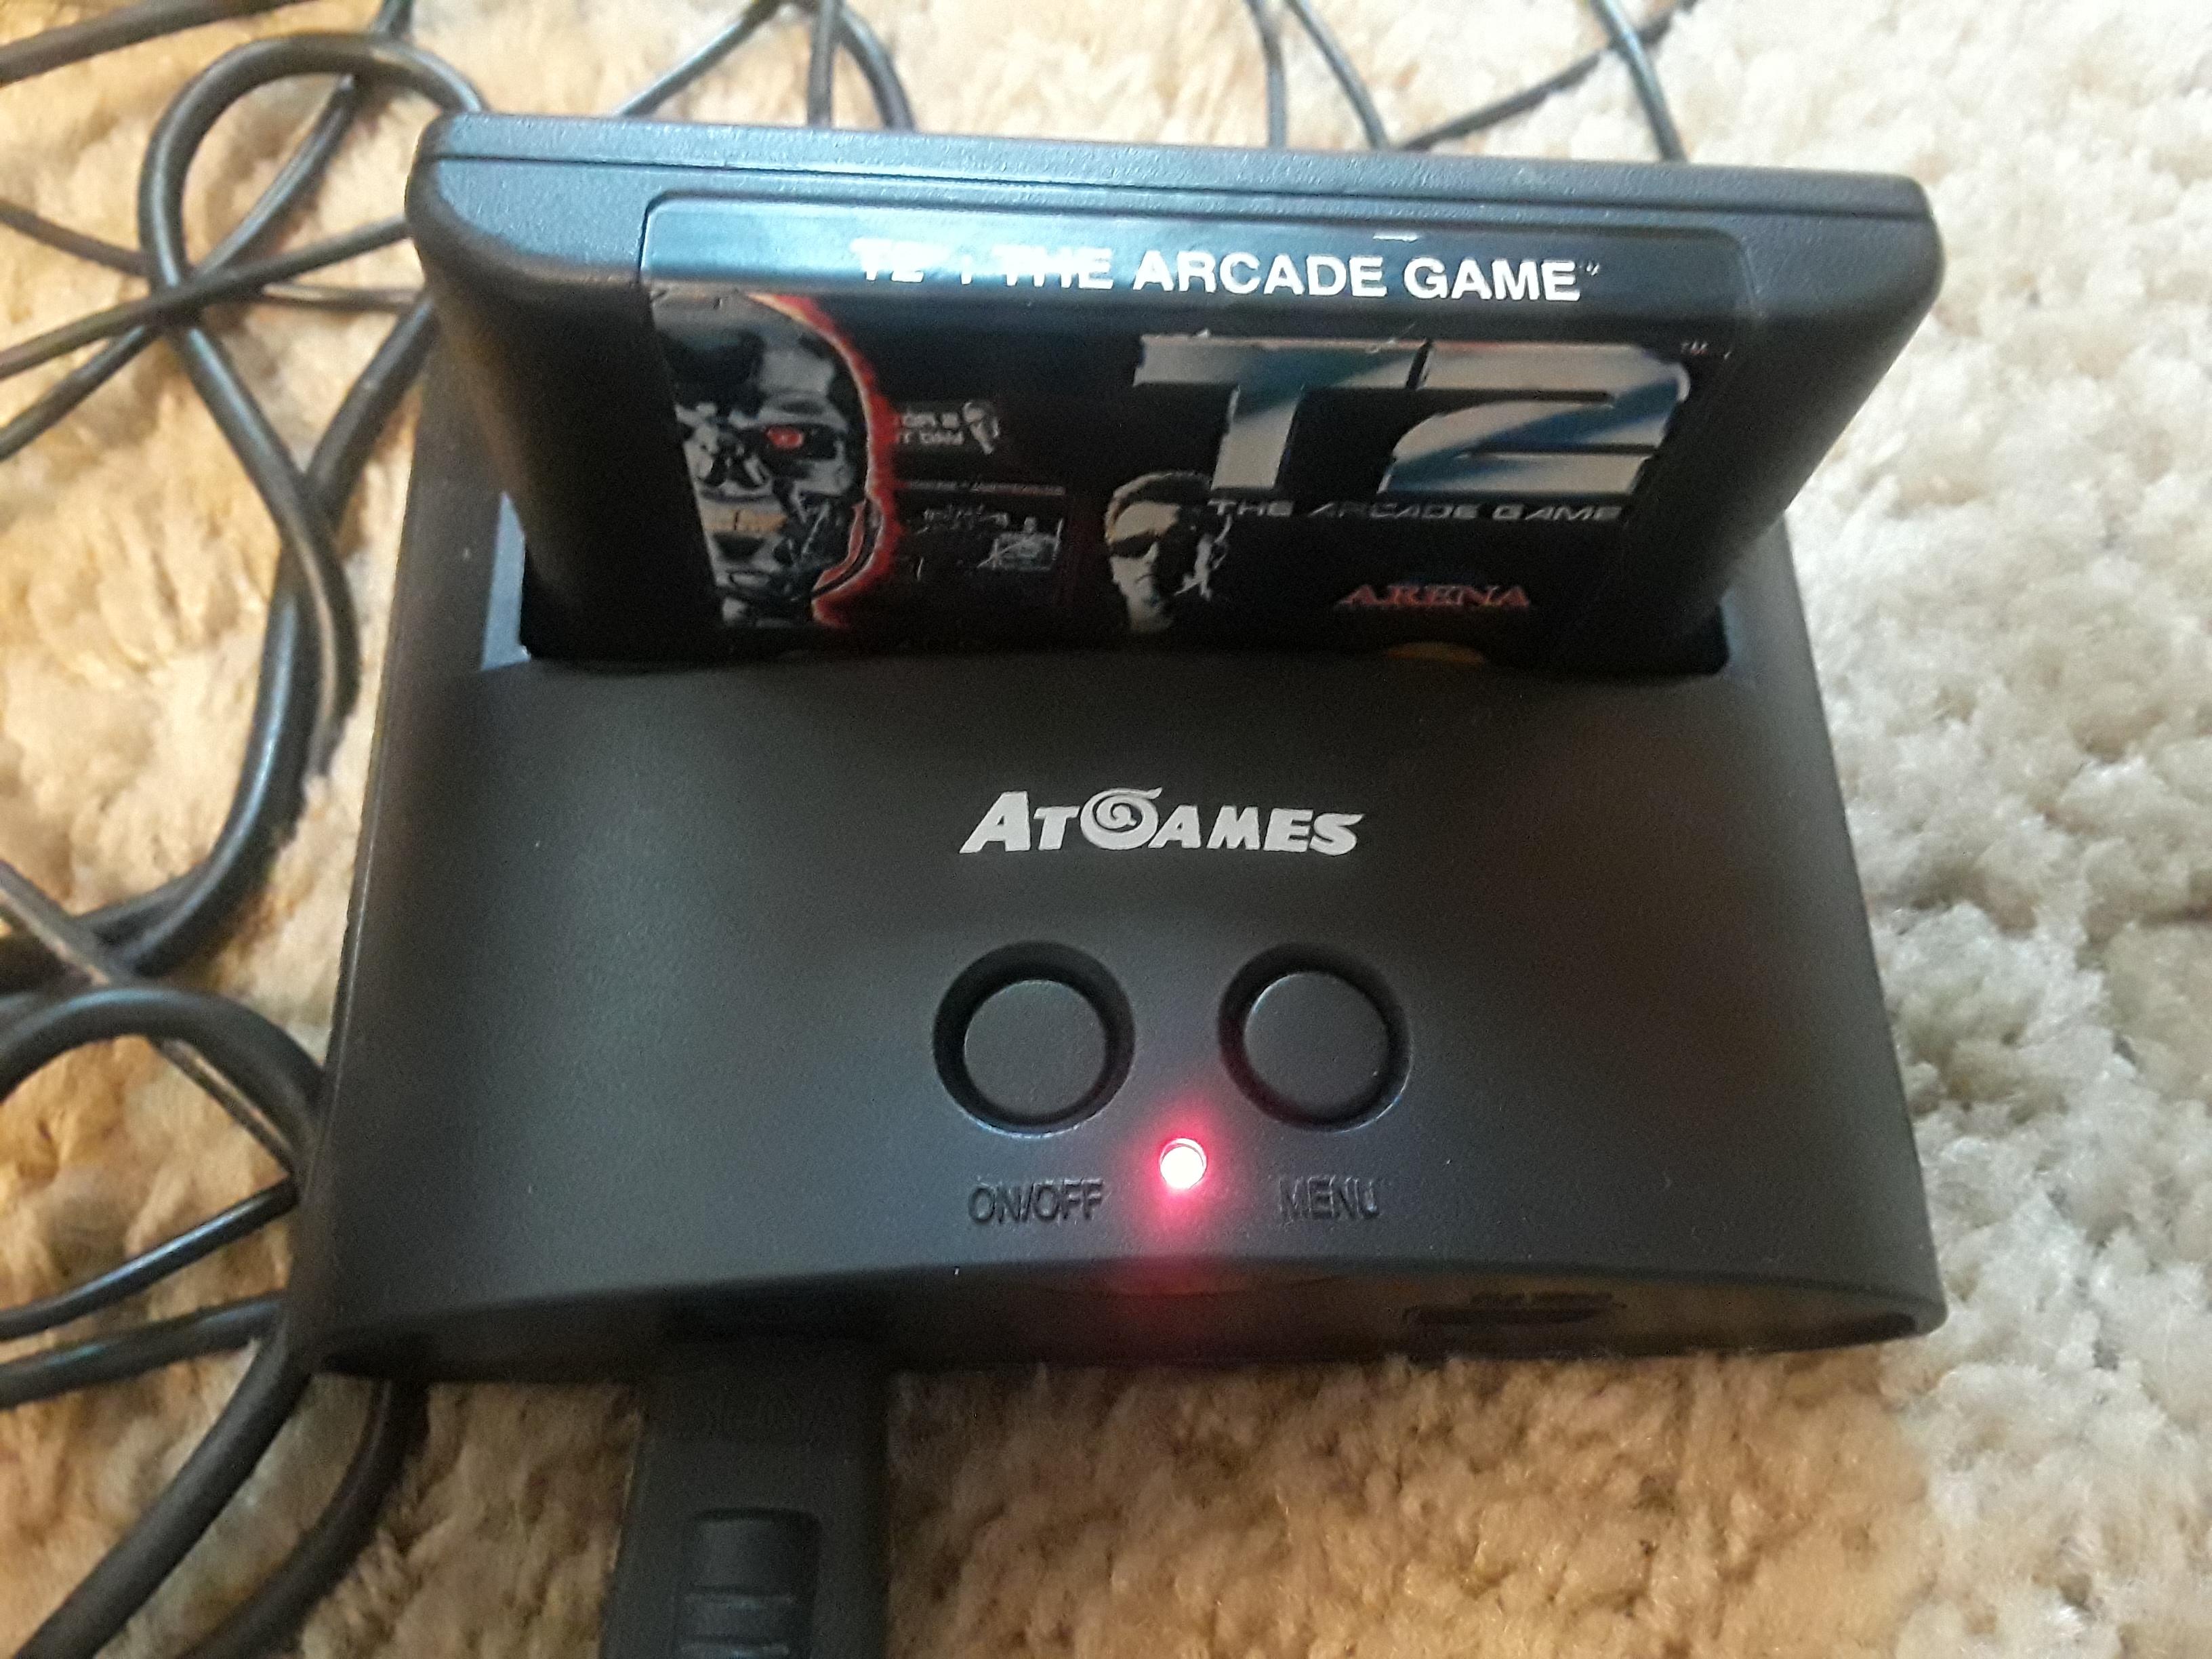 T2: The Arcade Game [Medium] 993,550 points